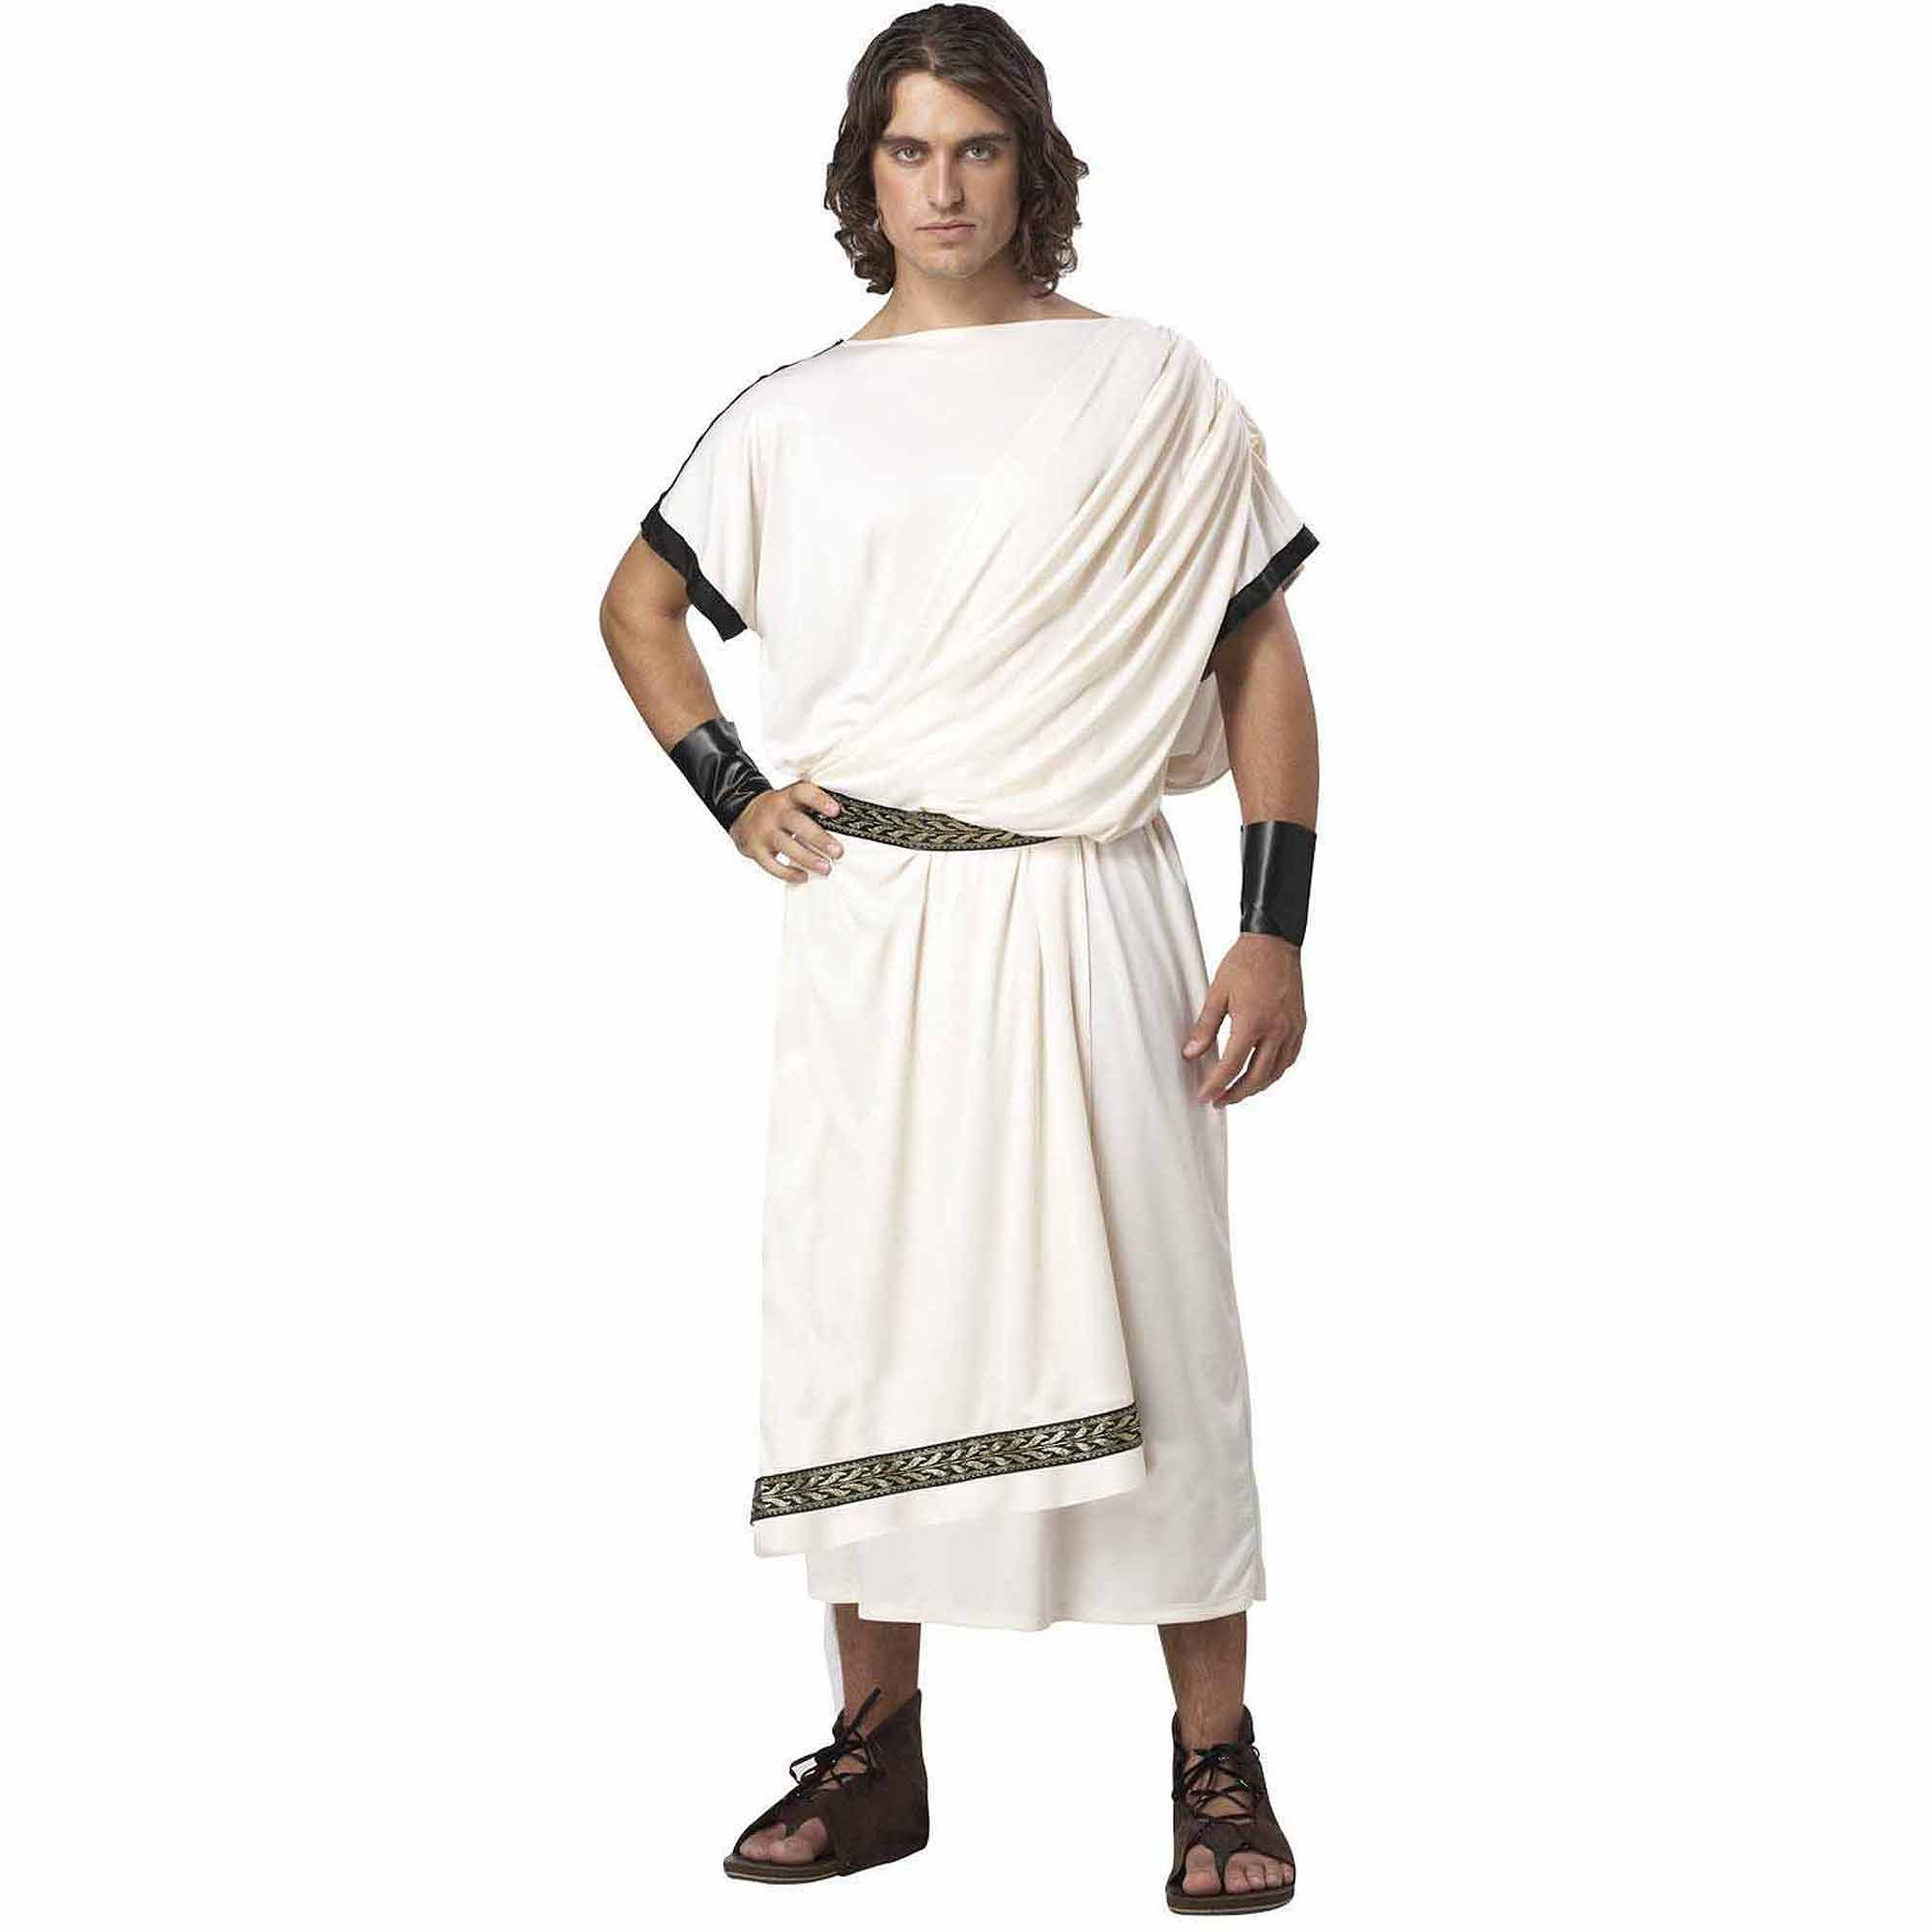 Halloween Costumes College 2020 God Men's Deluxe Classic Toga   Walmart.in 2020 | Roman costume